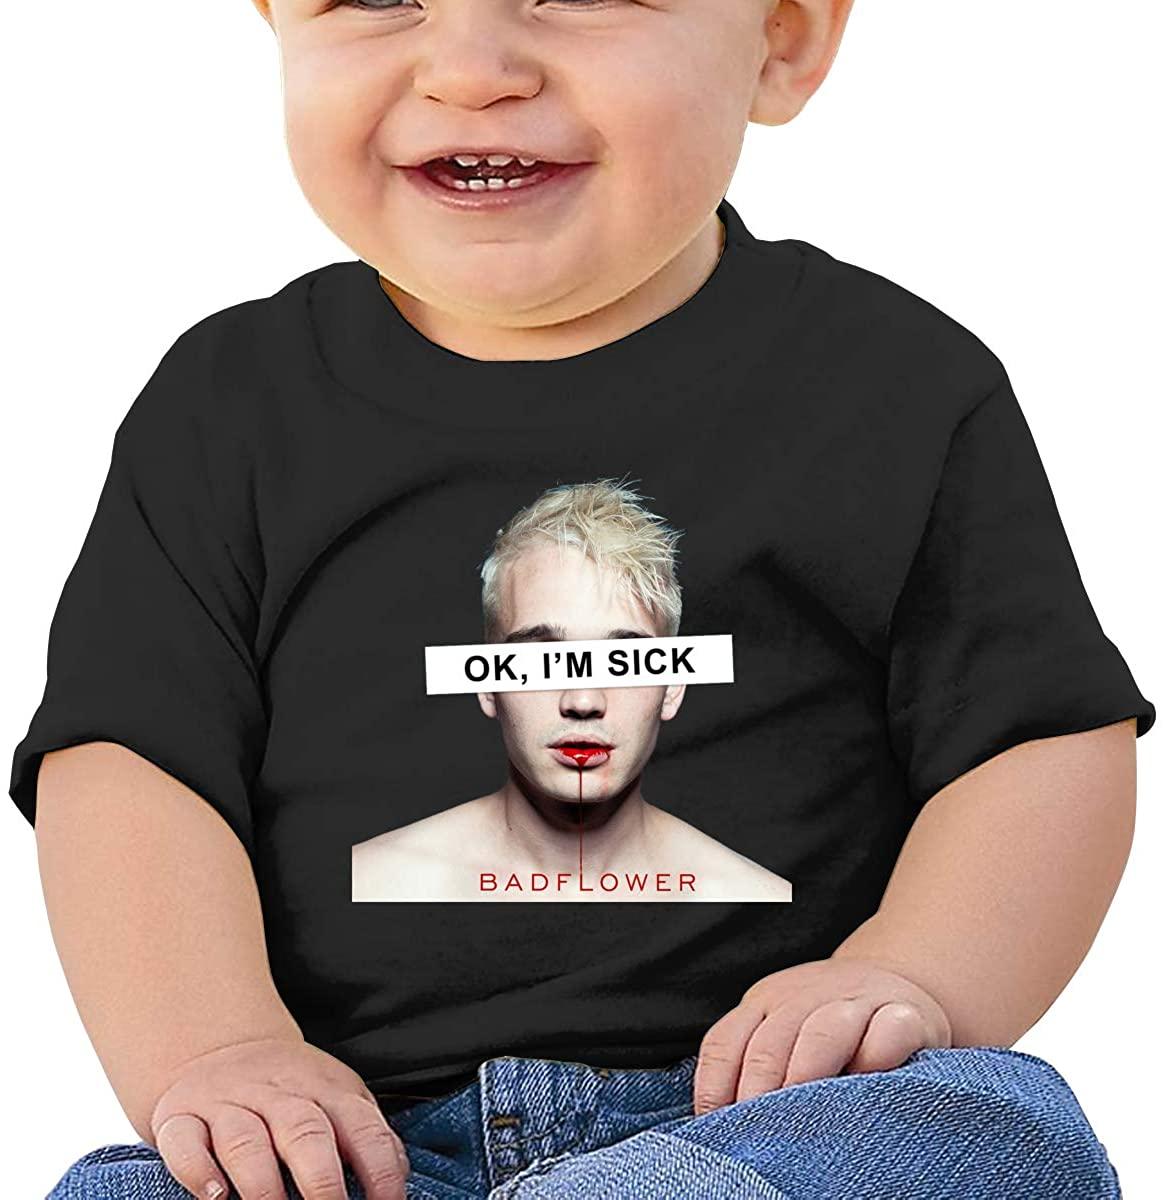 Short-Sleeved Colorful Comfortable Creative Shirt Badflower Baby T-Shirt